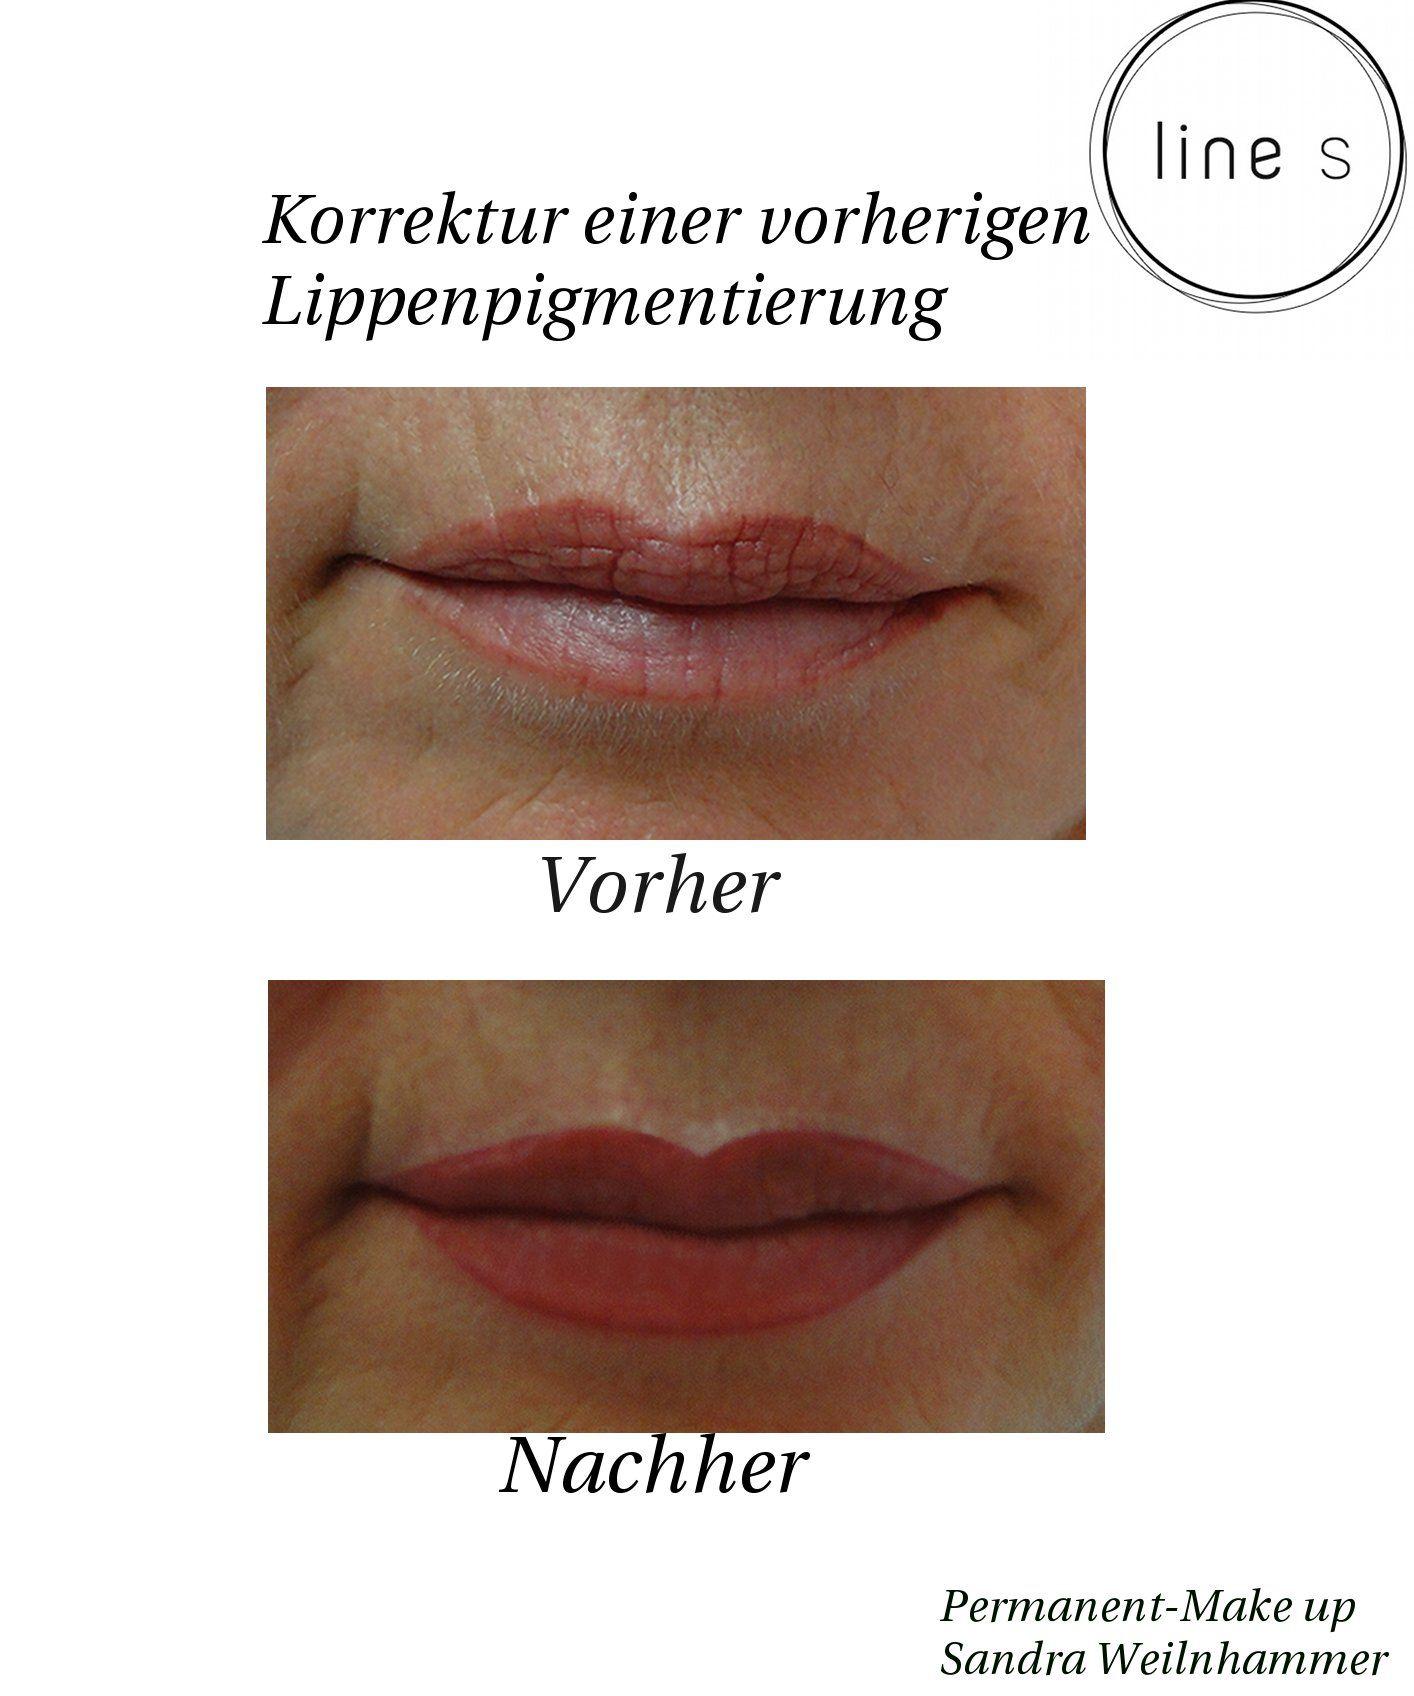 Lippenkorrektur Permanent Make Up Lippen Permanent Make Up Make Up Lippen Und Lippen Pigmentierung